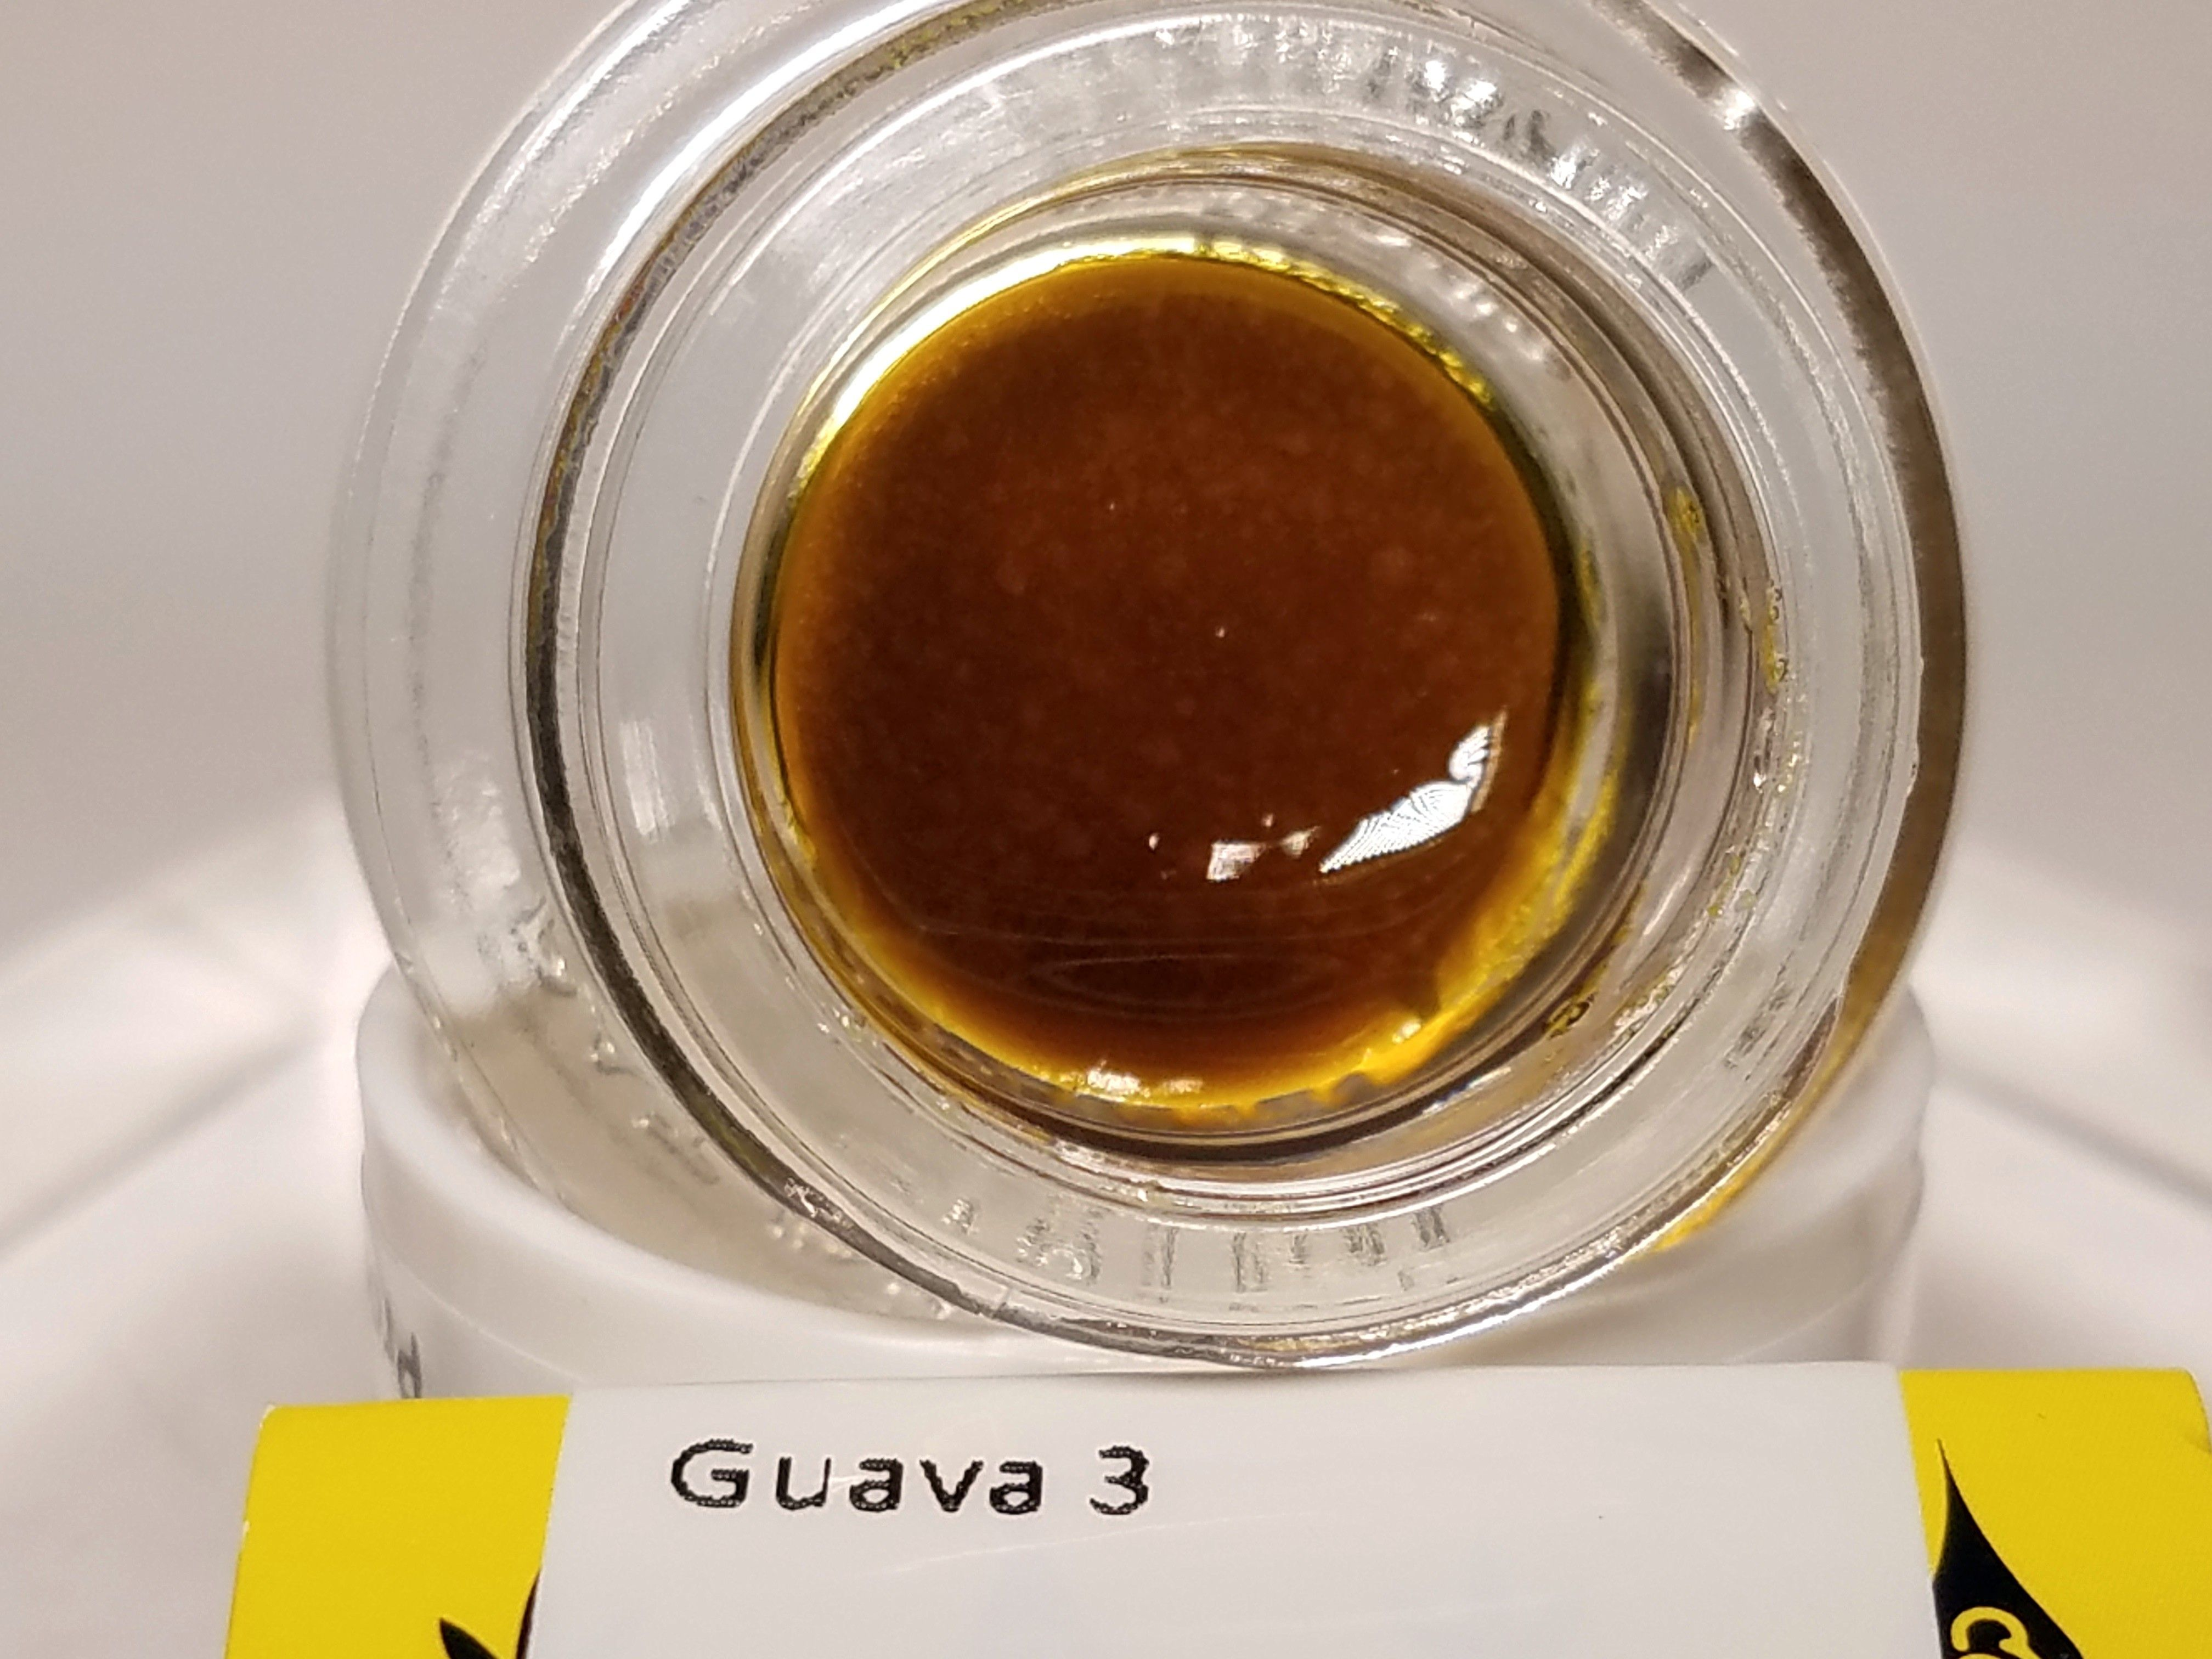 Bobsled - Guava 3, Hybrid, Sugar Sauce * 7/10 Sale!*